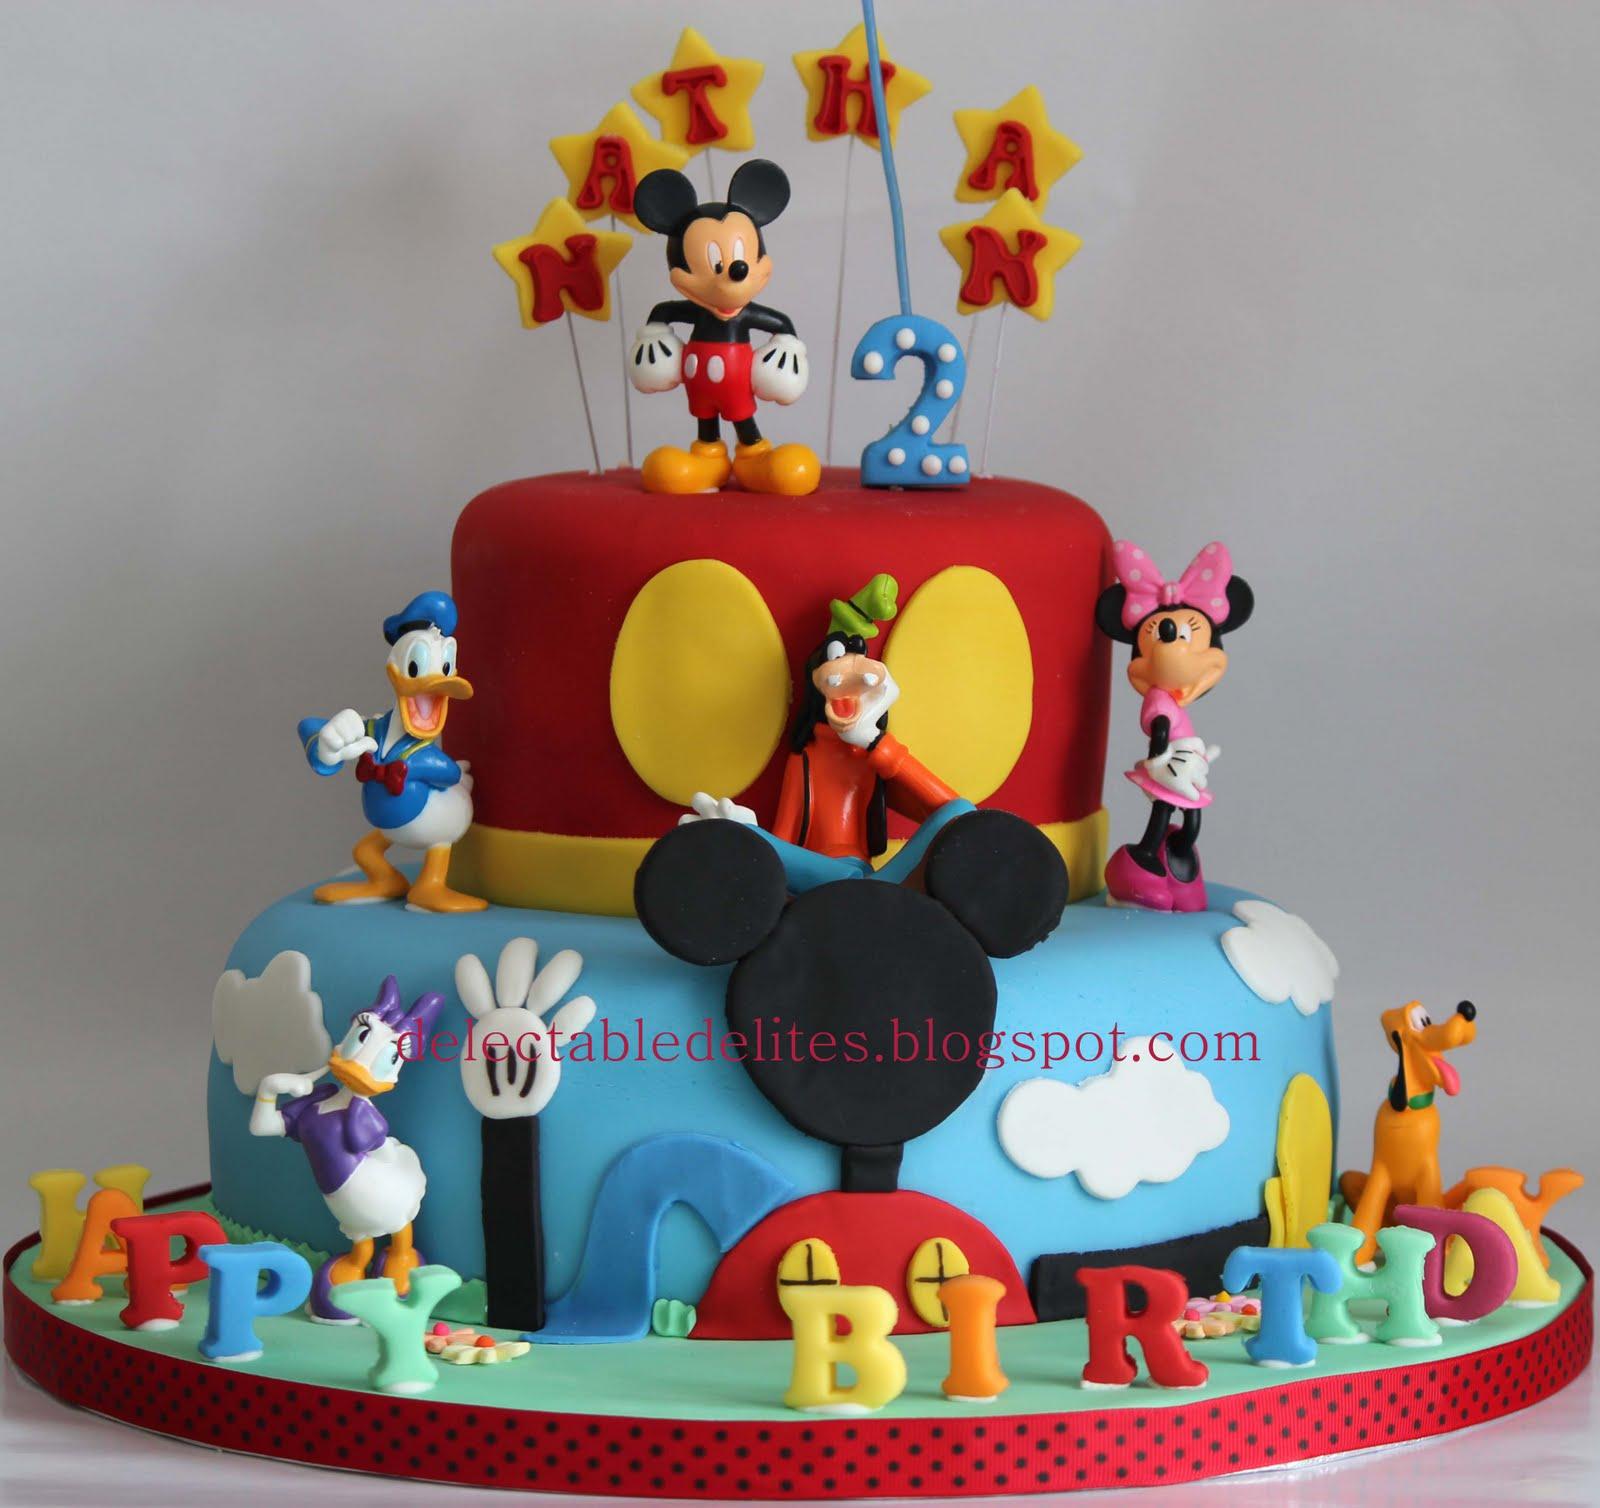 Marvelous 12 Design For Mickey Mouse Birthday Cupcakes Photo Mickey Mouse Funny Birthday Cards Online Elaedamsfinfo